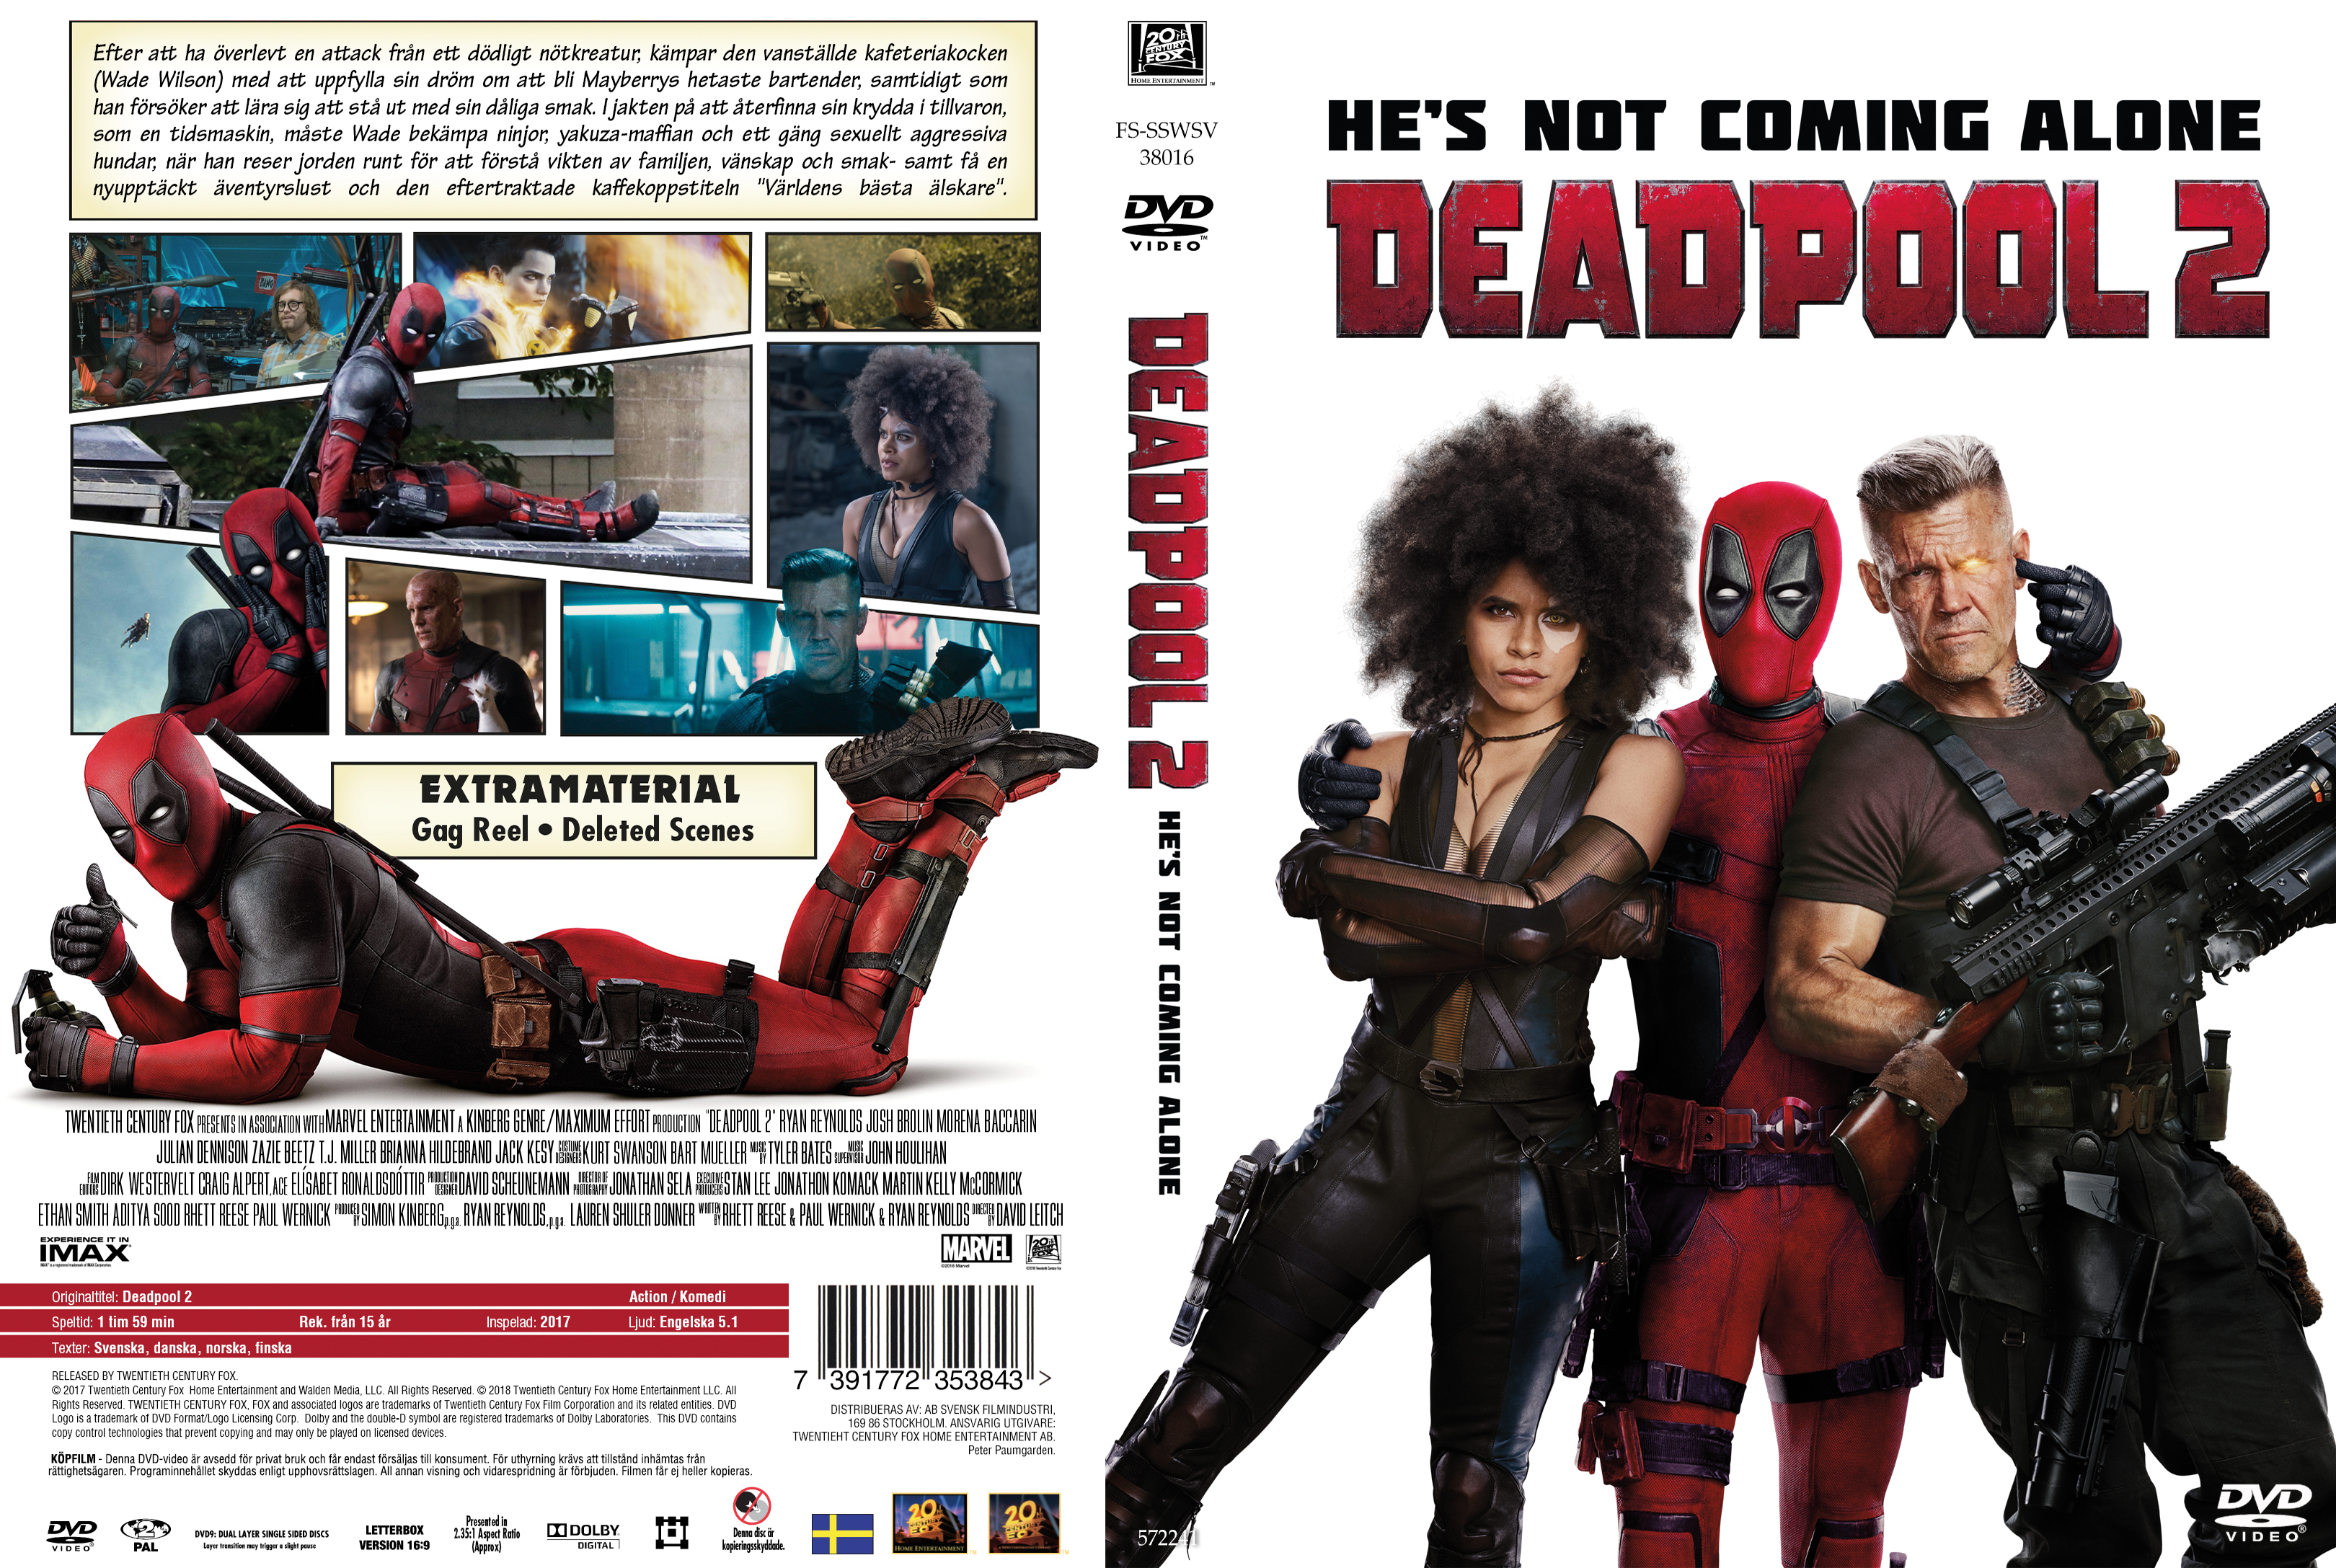 Covers Box Sk Deadpool 2 2018 High Quality Dvd Blueray Movie